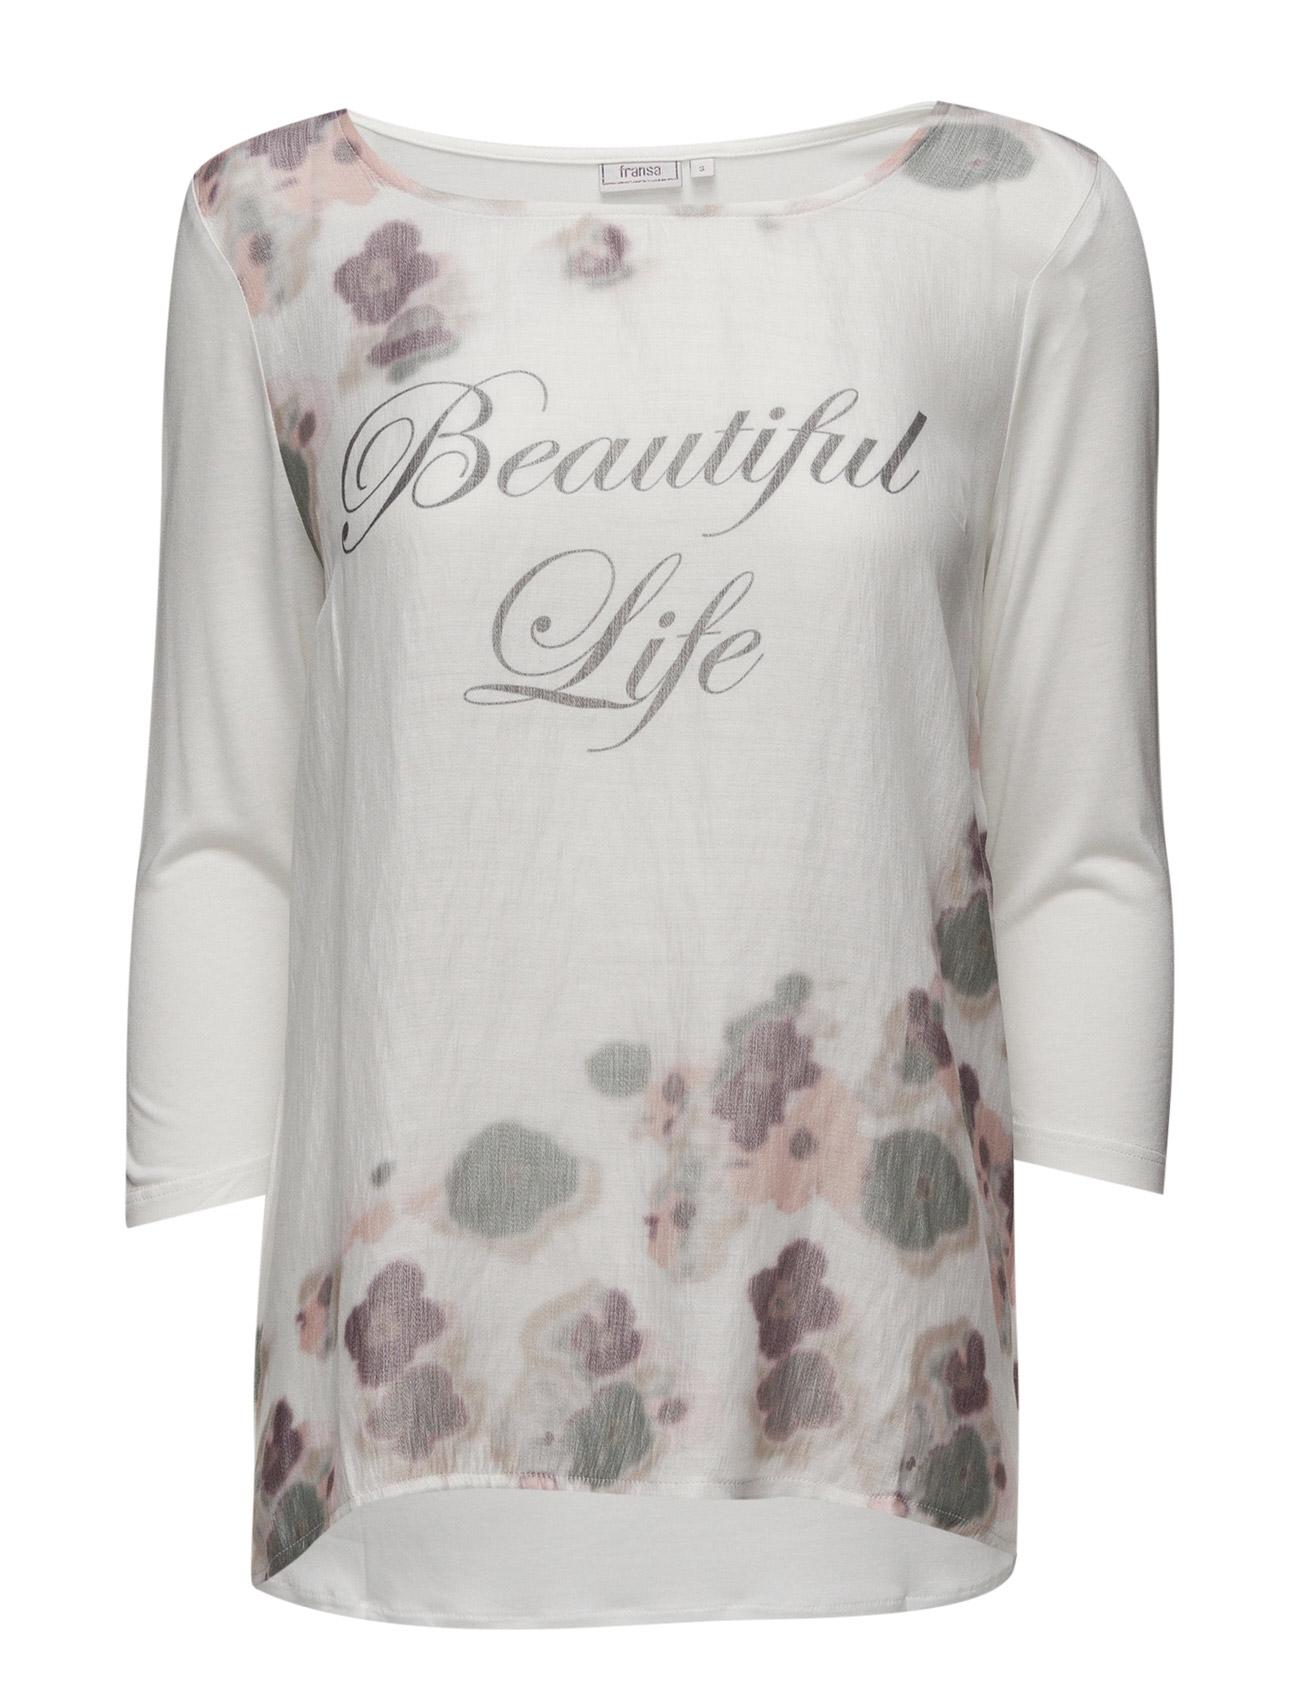 Rigrow 1 T-Shirt Fransa Langærmede til Damer i Antik